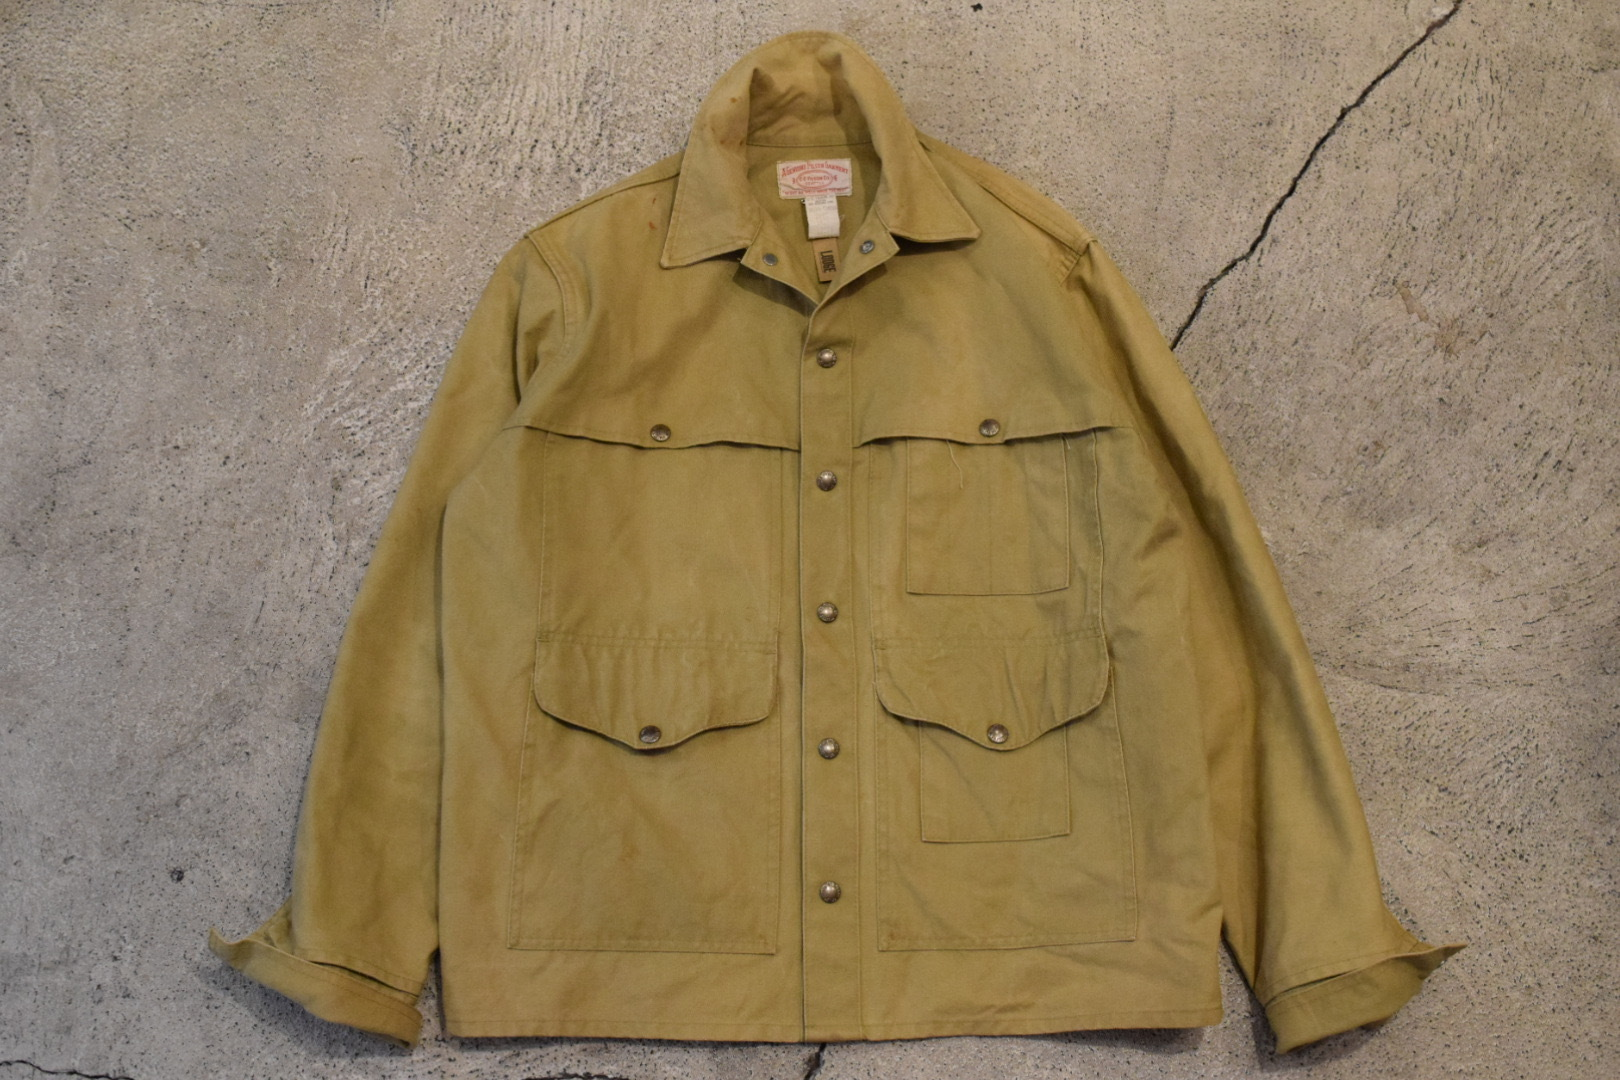 USED FILSON Tin Cloth Cotton Jacket 40 0873